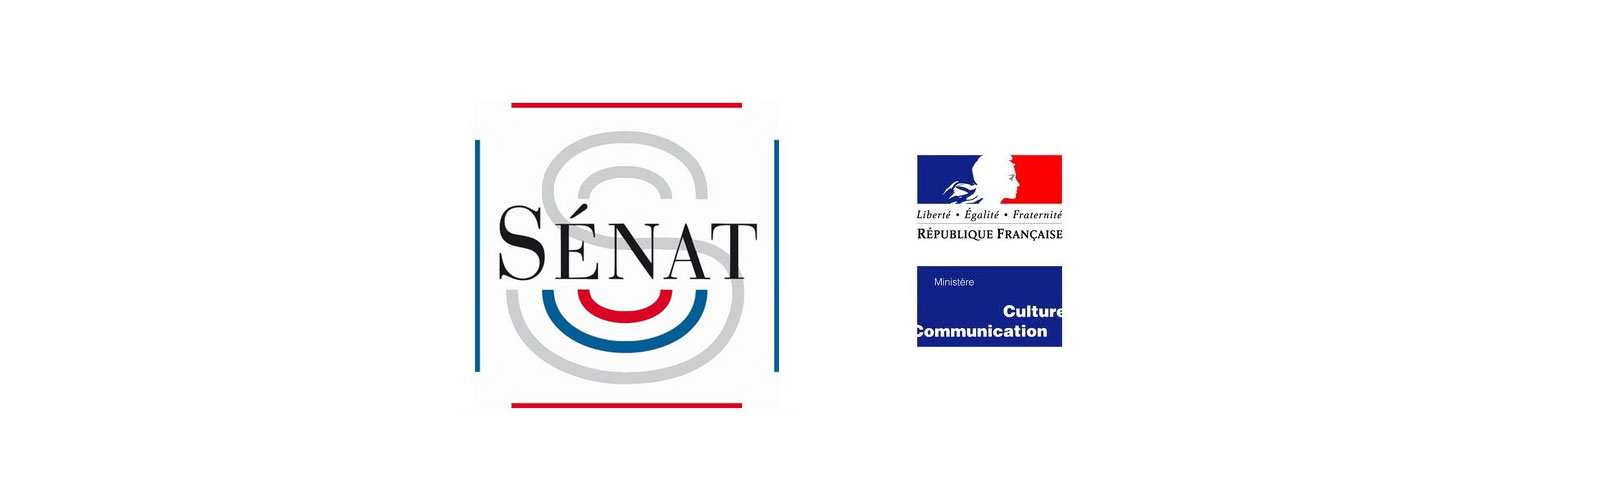 senat-ministere-culture